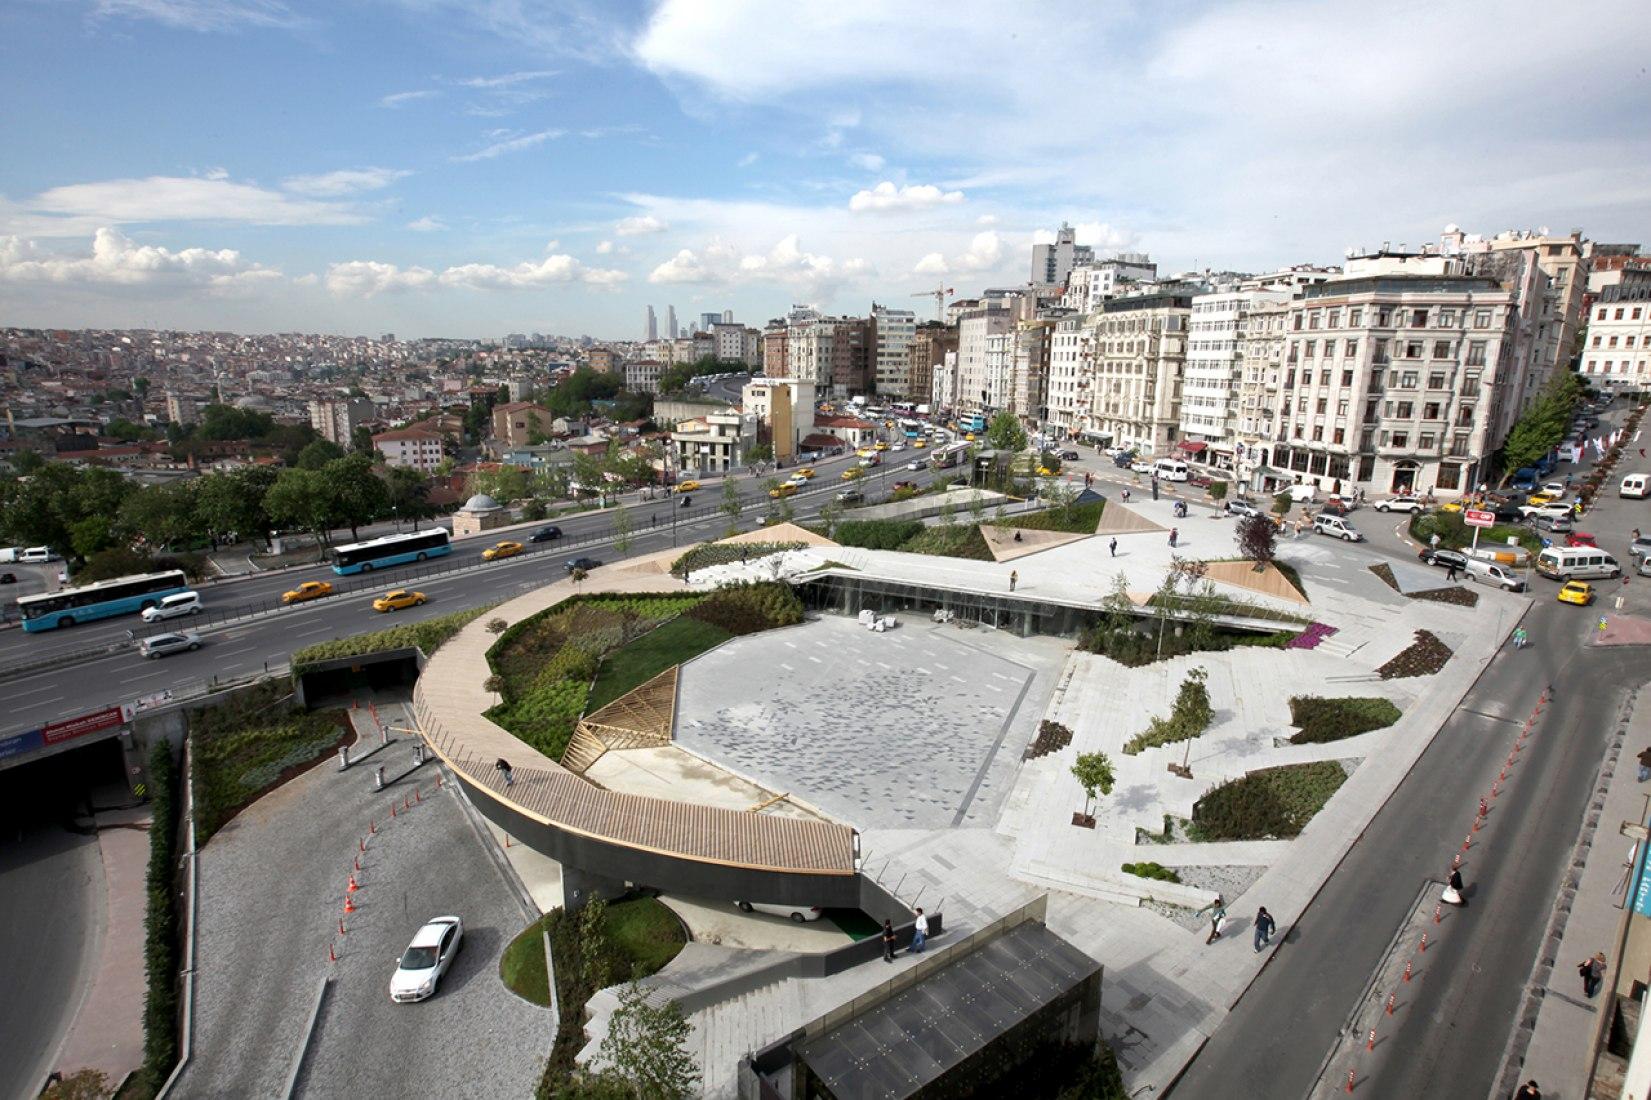 Vista general. Parque Şişhane, Estambul, por SANALarc. Fotografía © SANAL architecture | urbanism